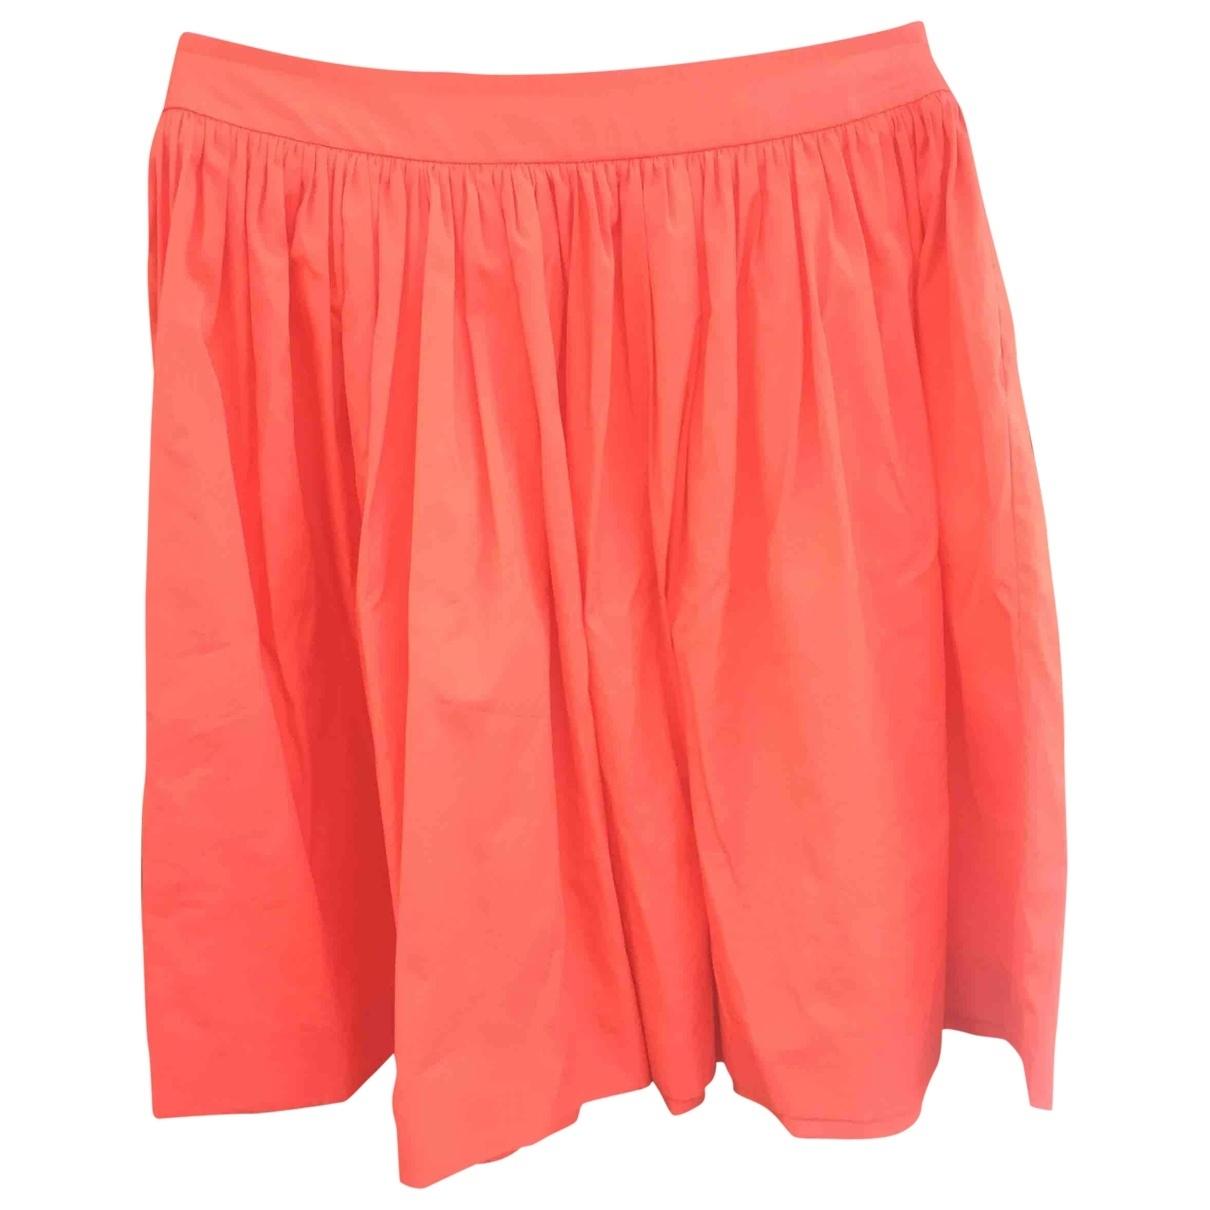 Prada \N Red Cotton skirt for Women 42 IT